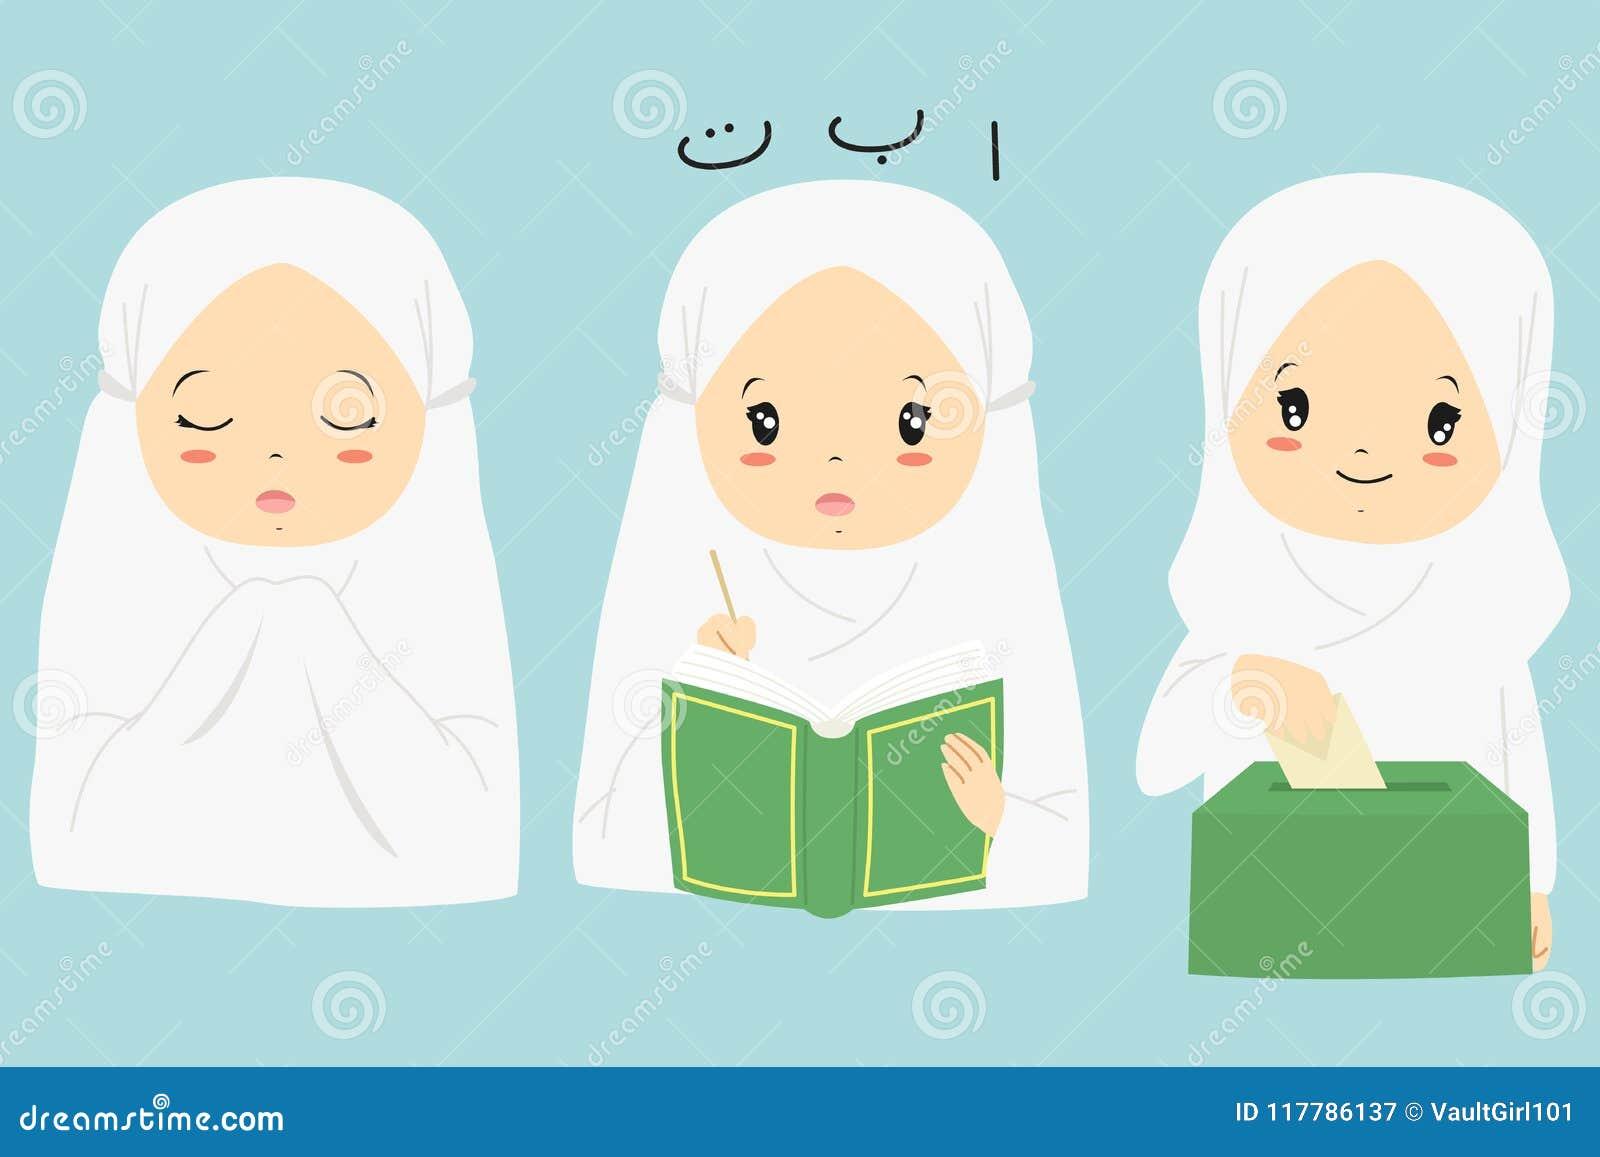 Muslim Girl Cartoon Vector Collection